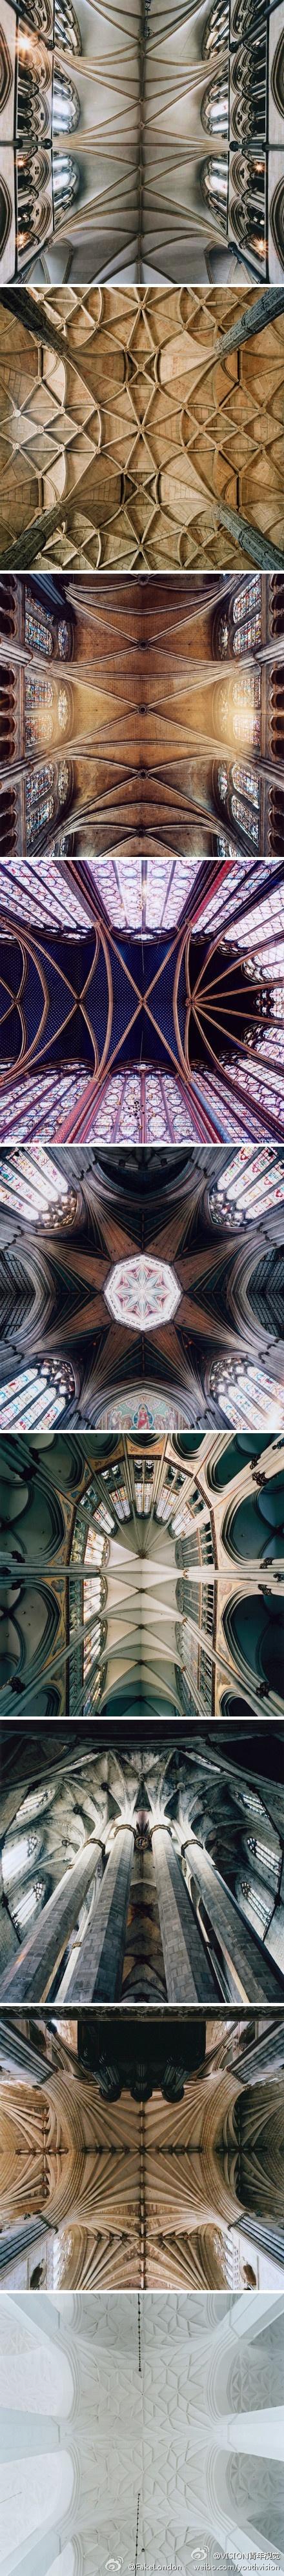 Cathedrals- interior